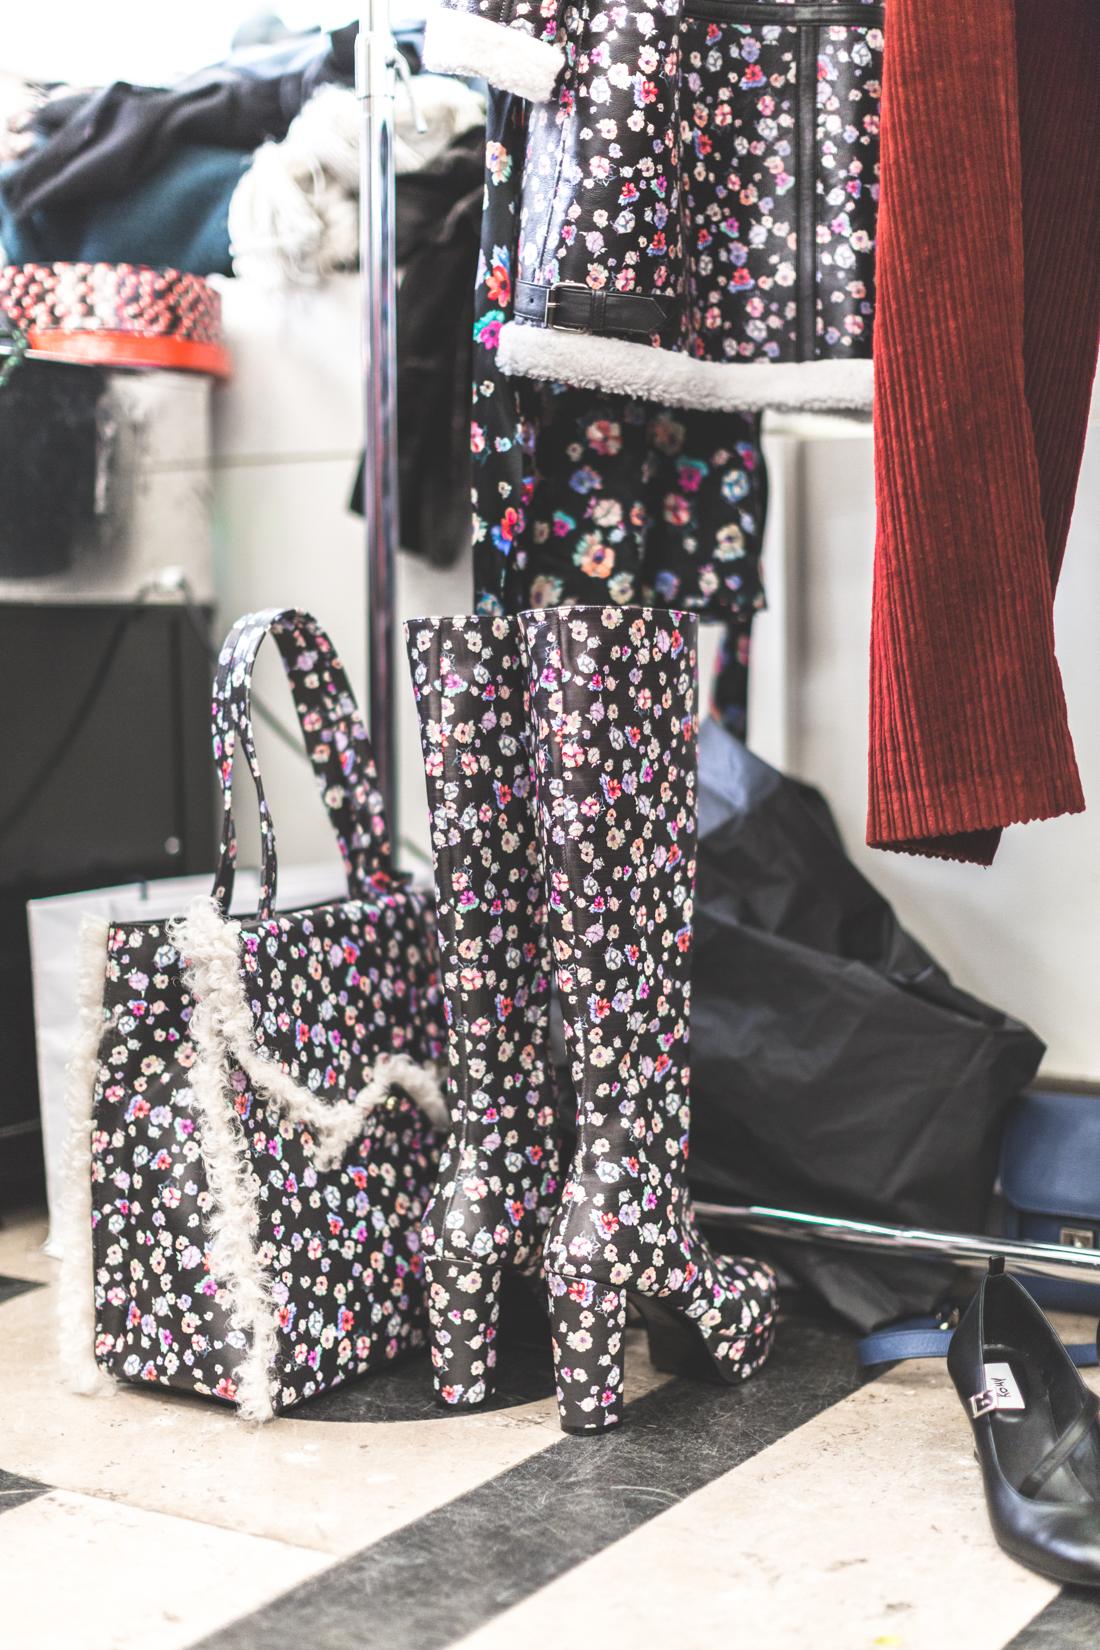 photo_backstage_paulandjoe_fw17_copyright_Pauline_Privez_paulinefashionblog_com-8